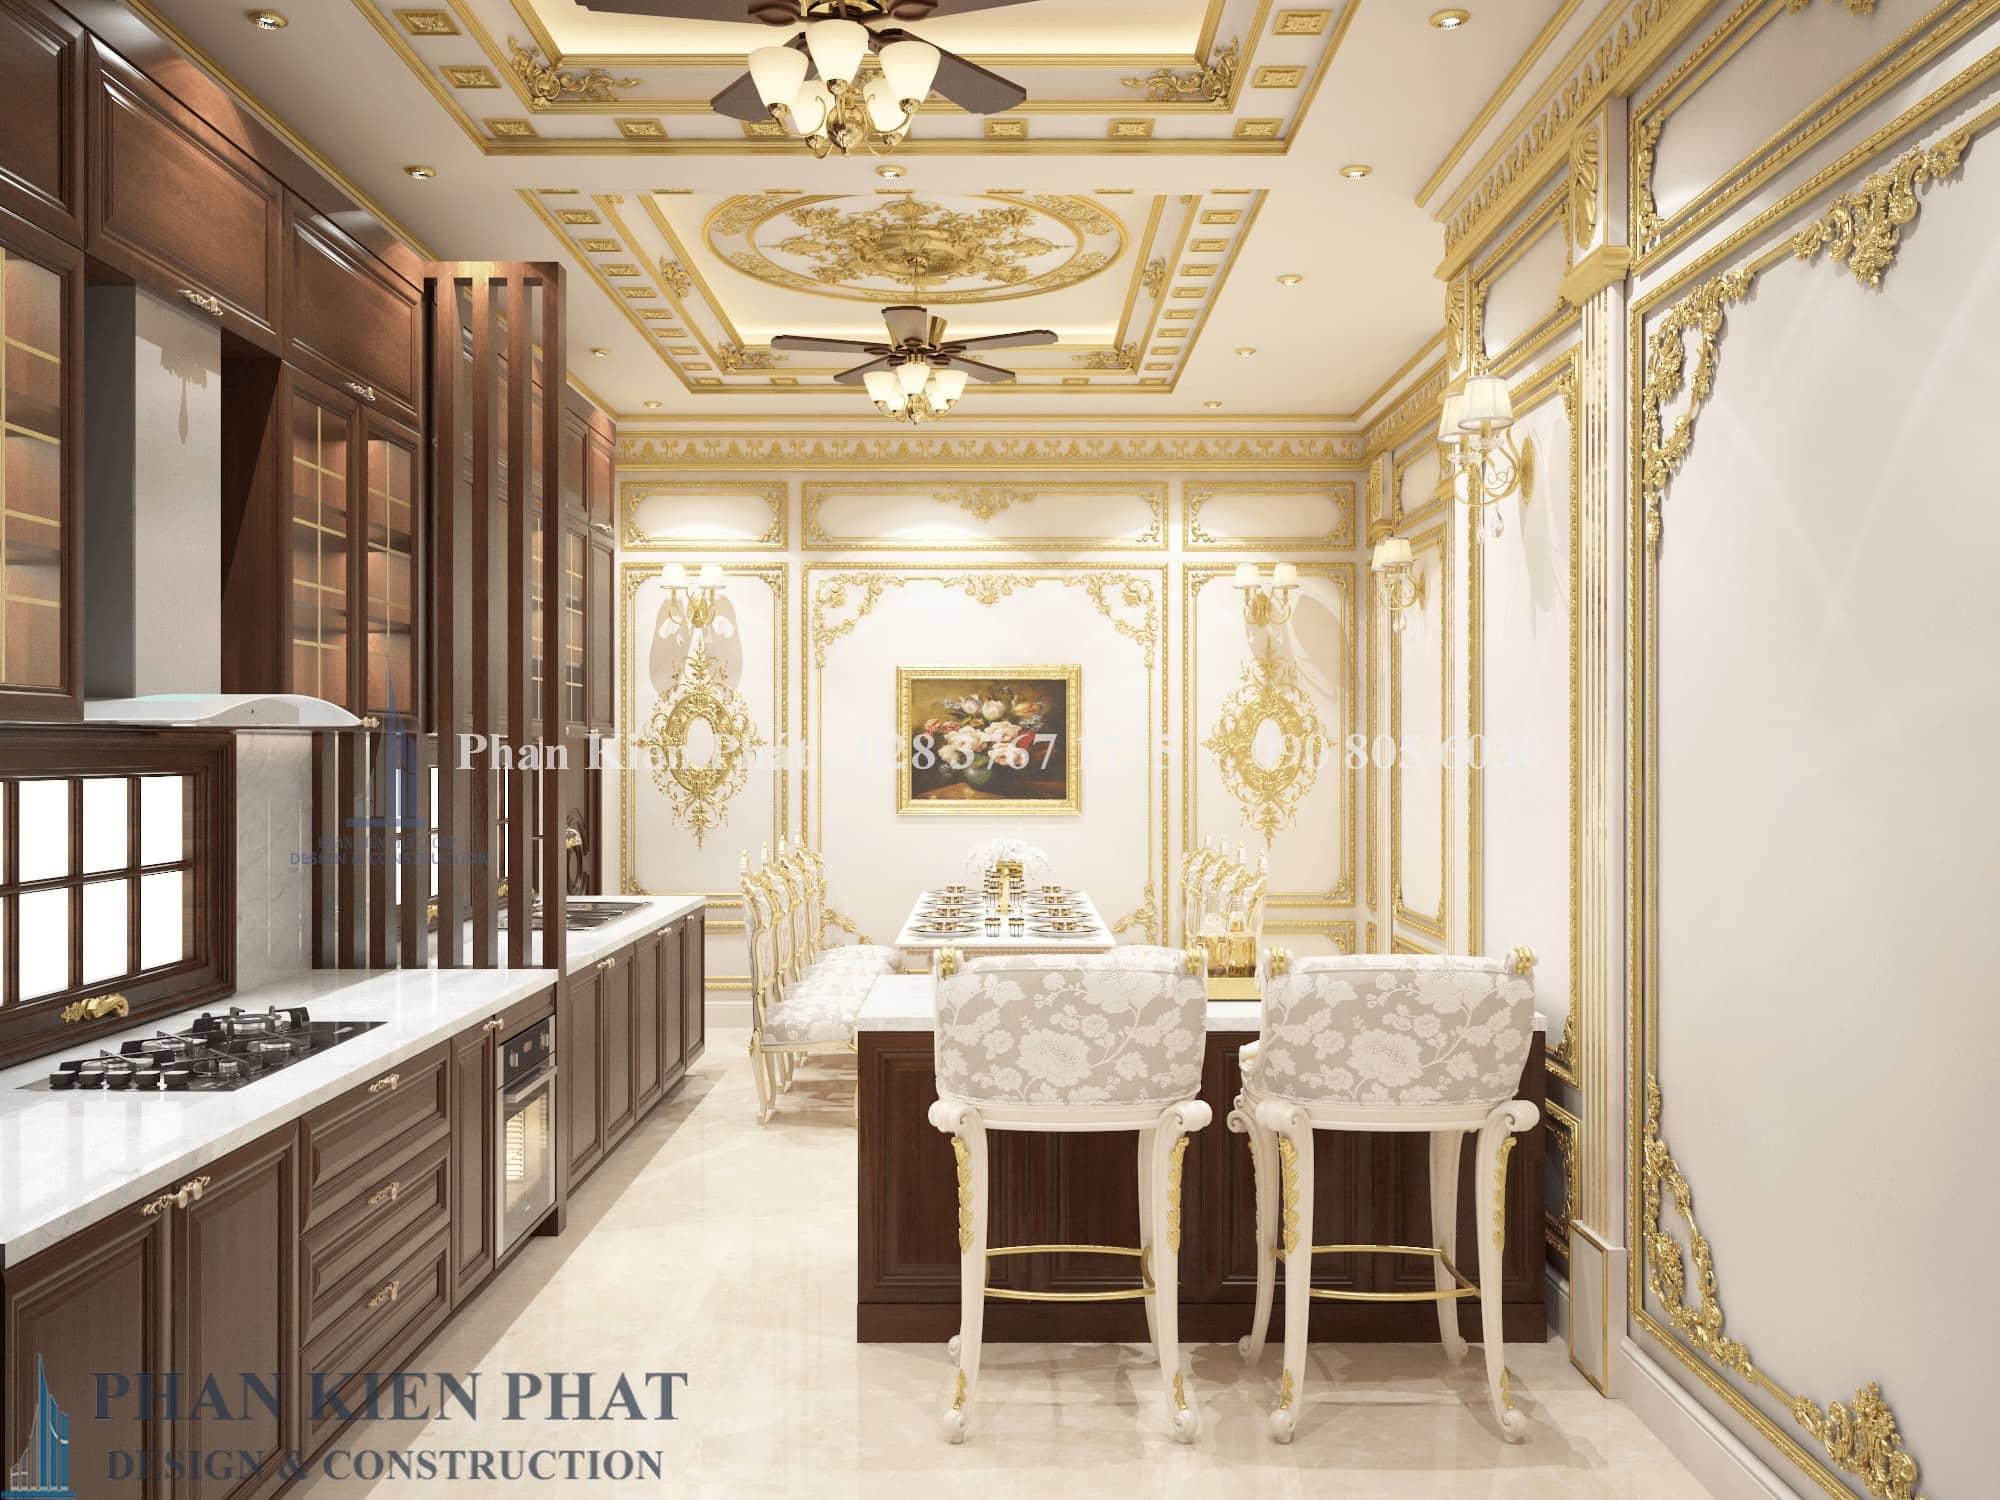 Noi That Phong Bep An Biet Thu Co Dien Dep View 1 - thiết kế biệt thự cổ điển